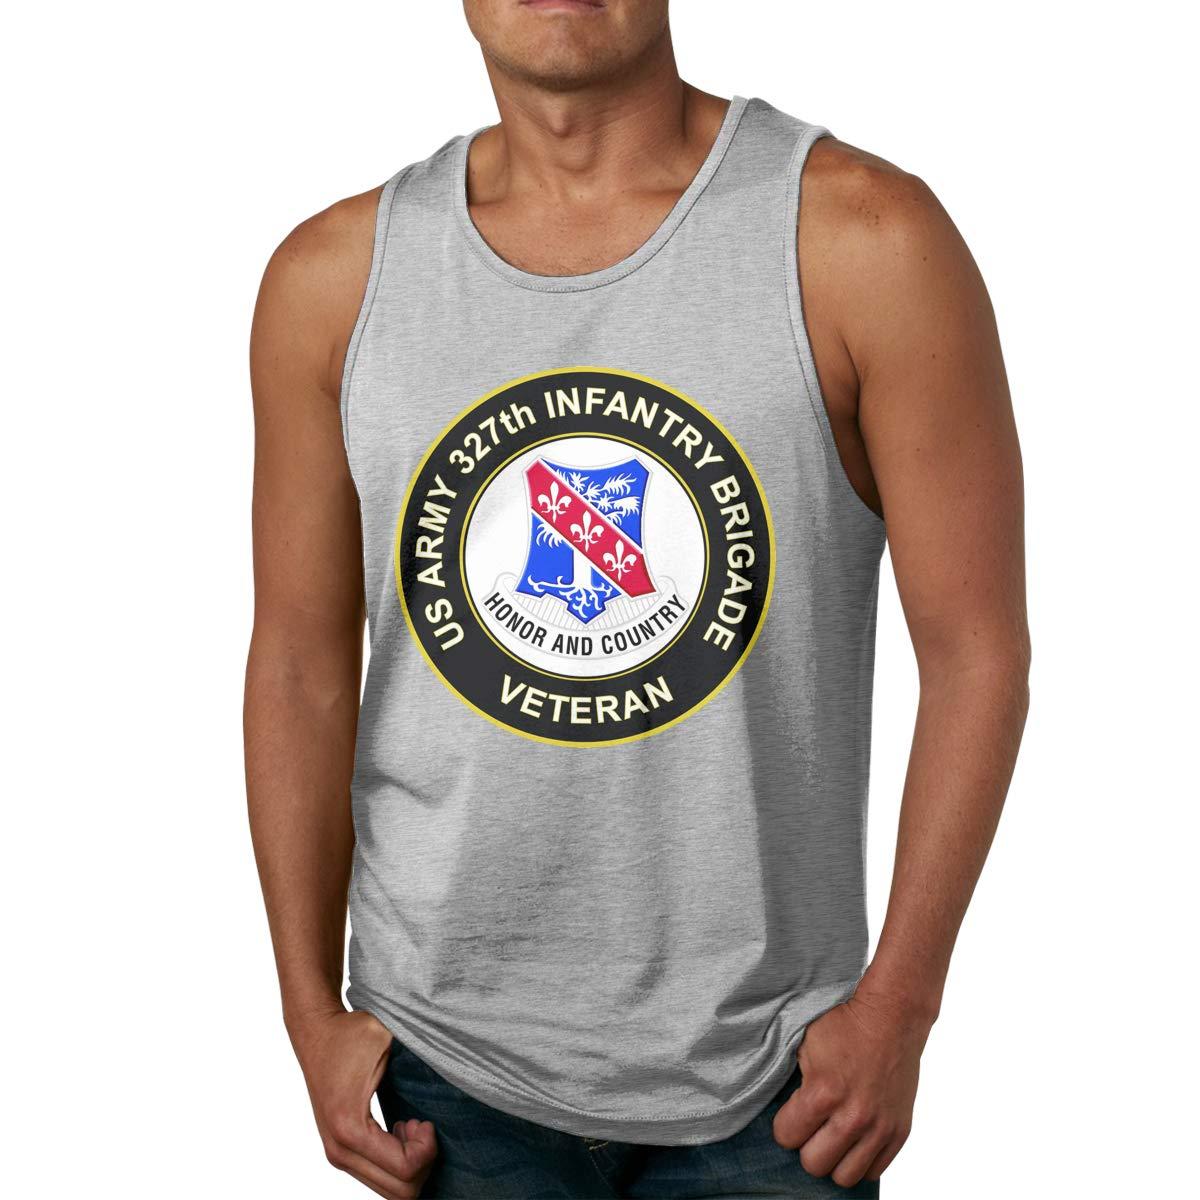 Army 327th Infantry Brigade Veteran Mens Undershirts Tank Tops U.S